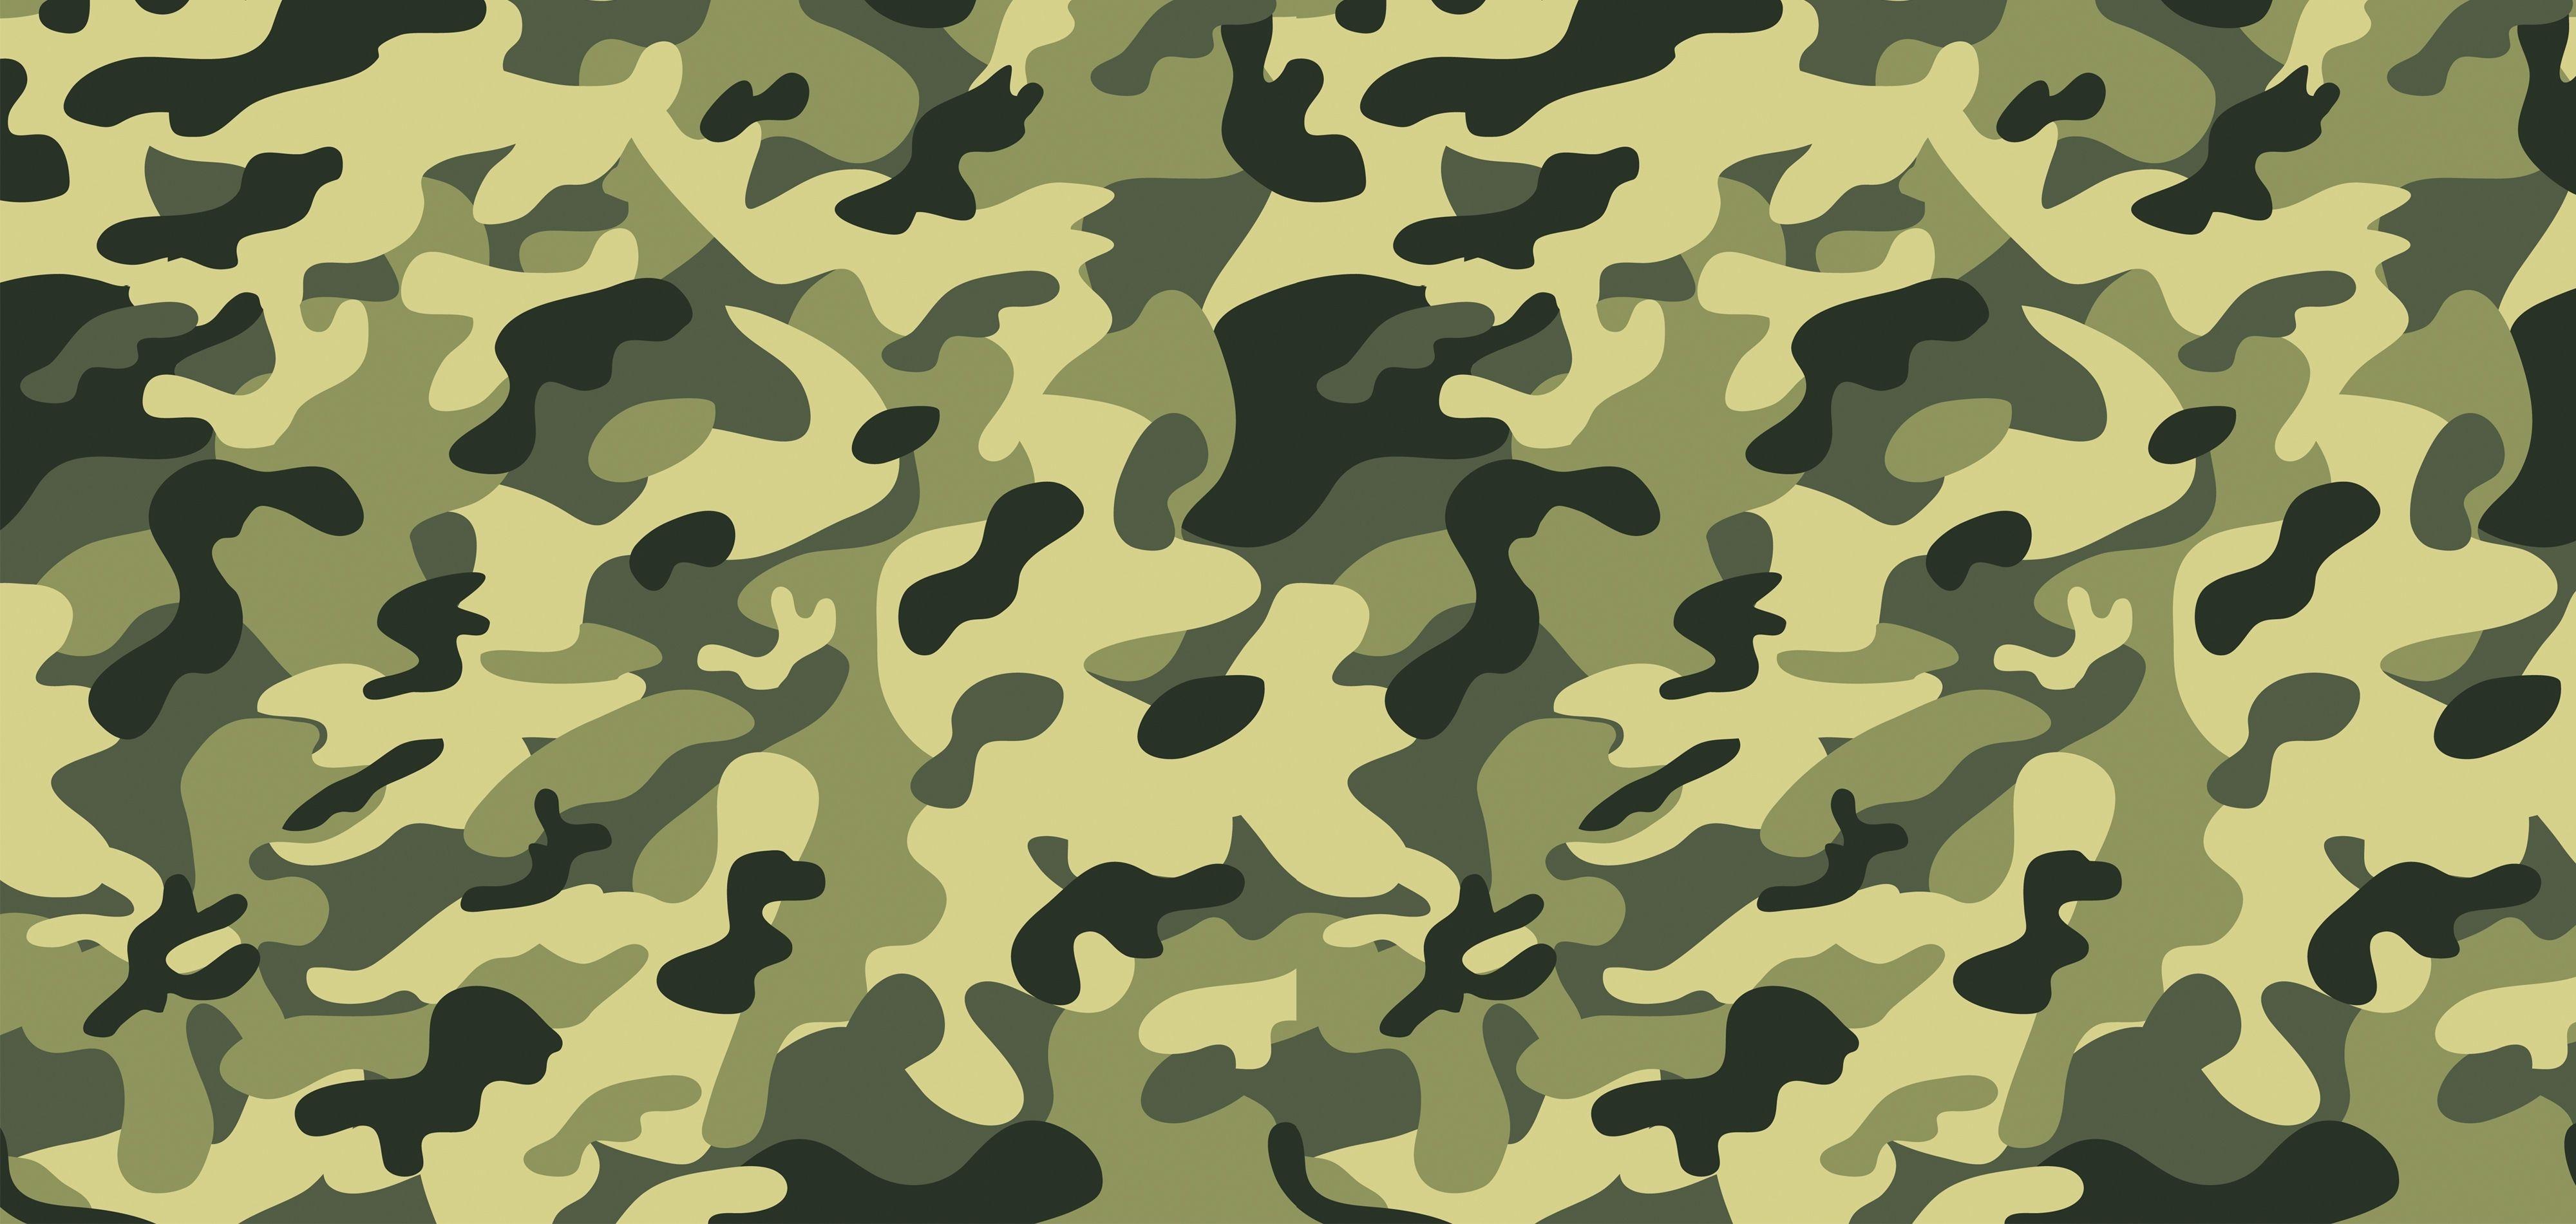 Free Printable Camo !!!!!!!!!! It Works Too! Download Original - Free Printable Camouflage Stencils